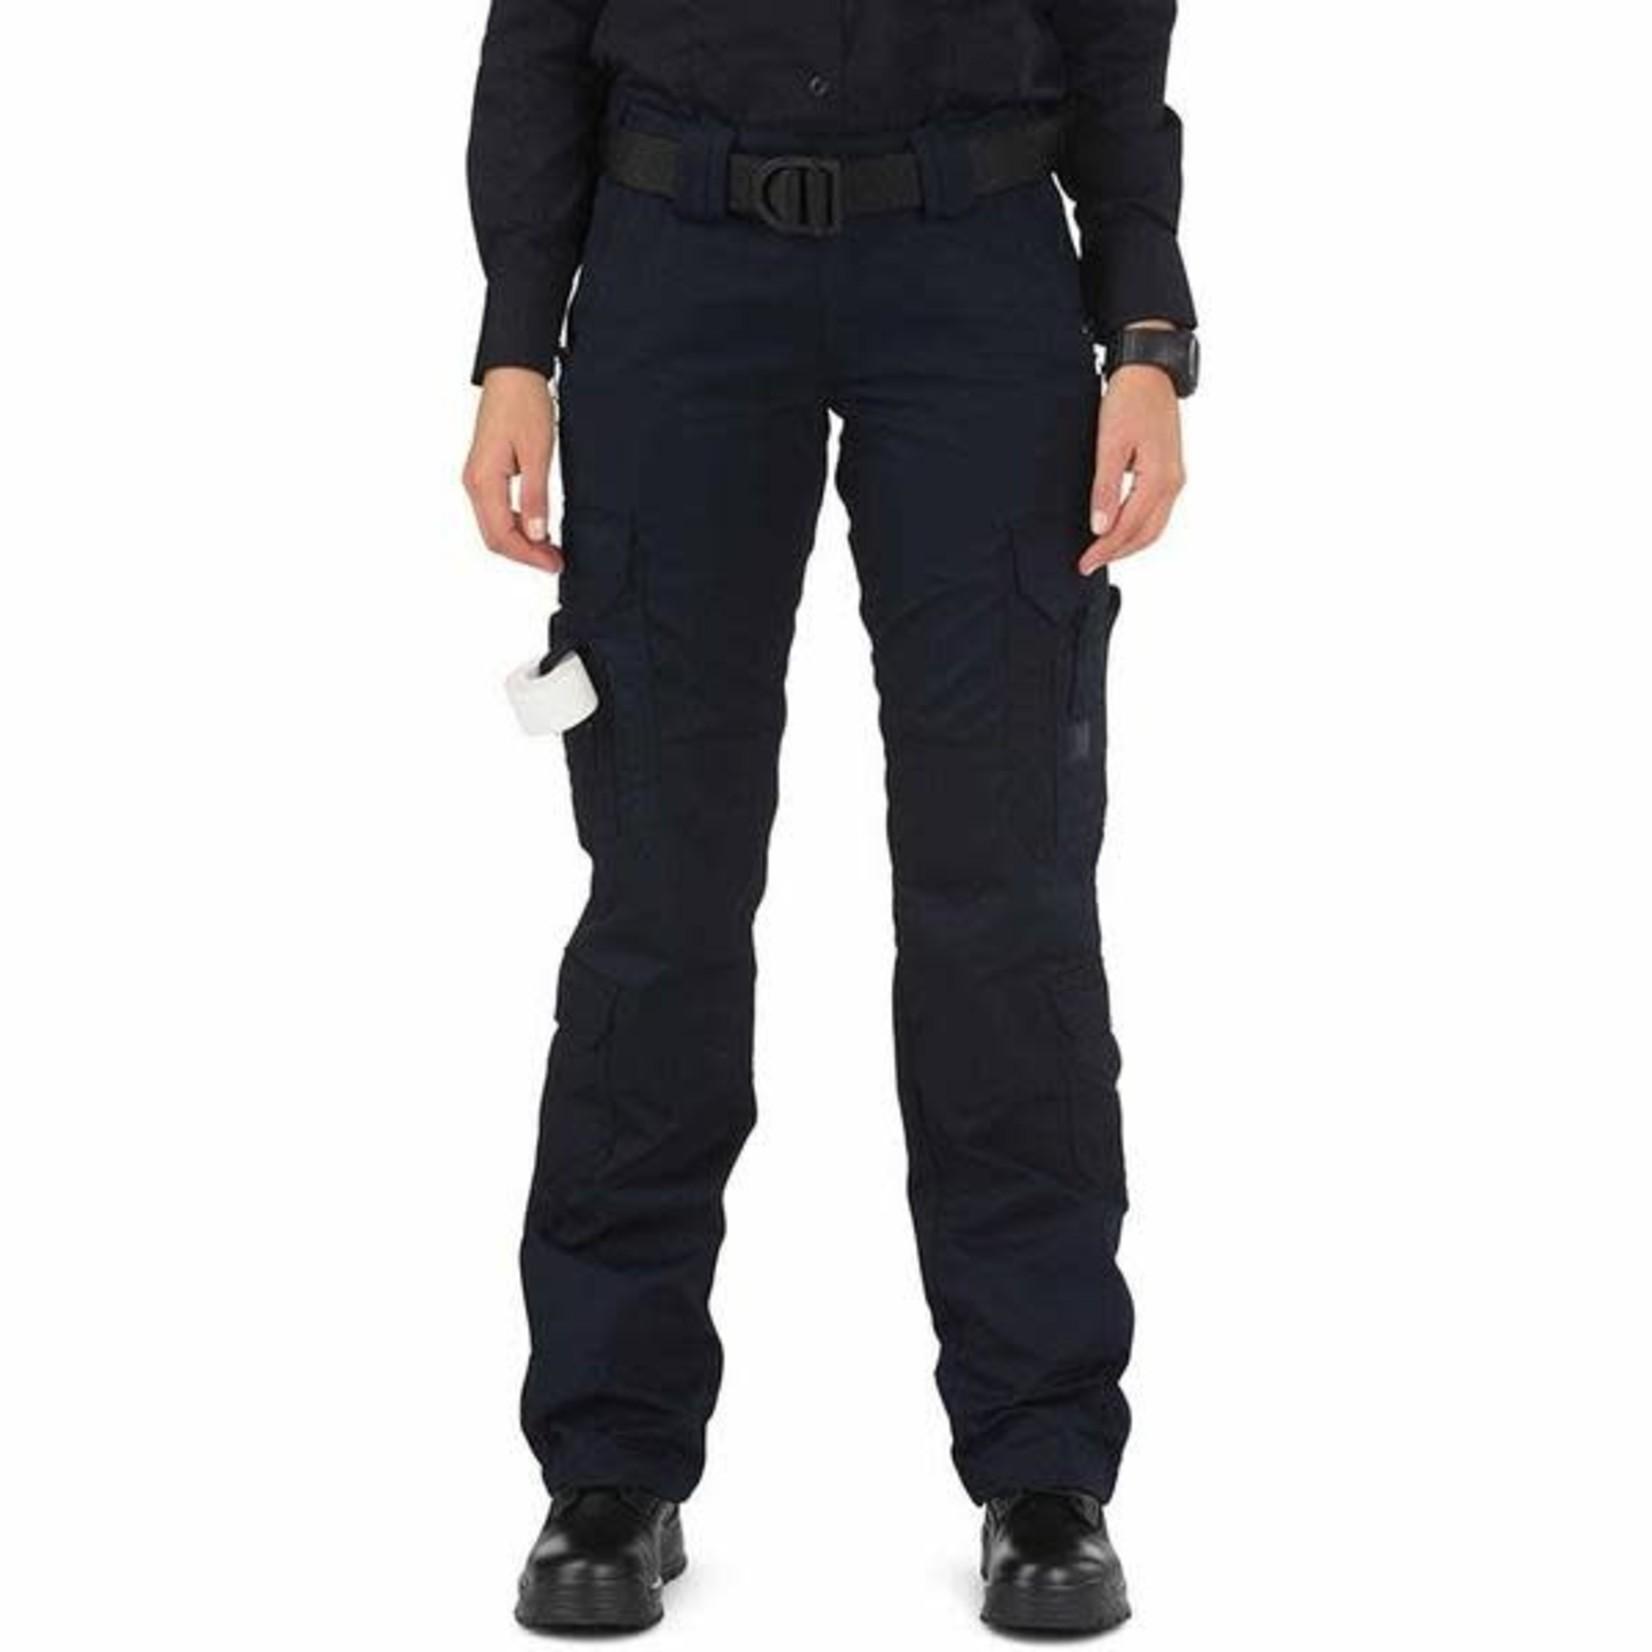 5.11 Tactical 5.11 Women's EMS Pants